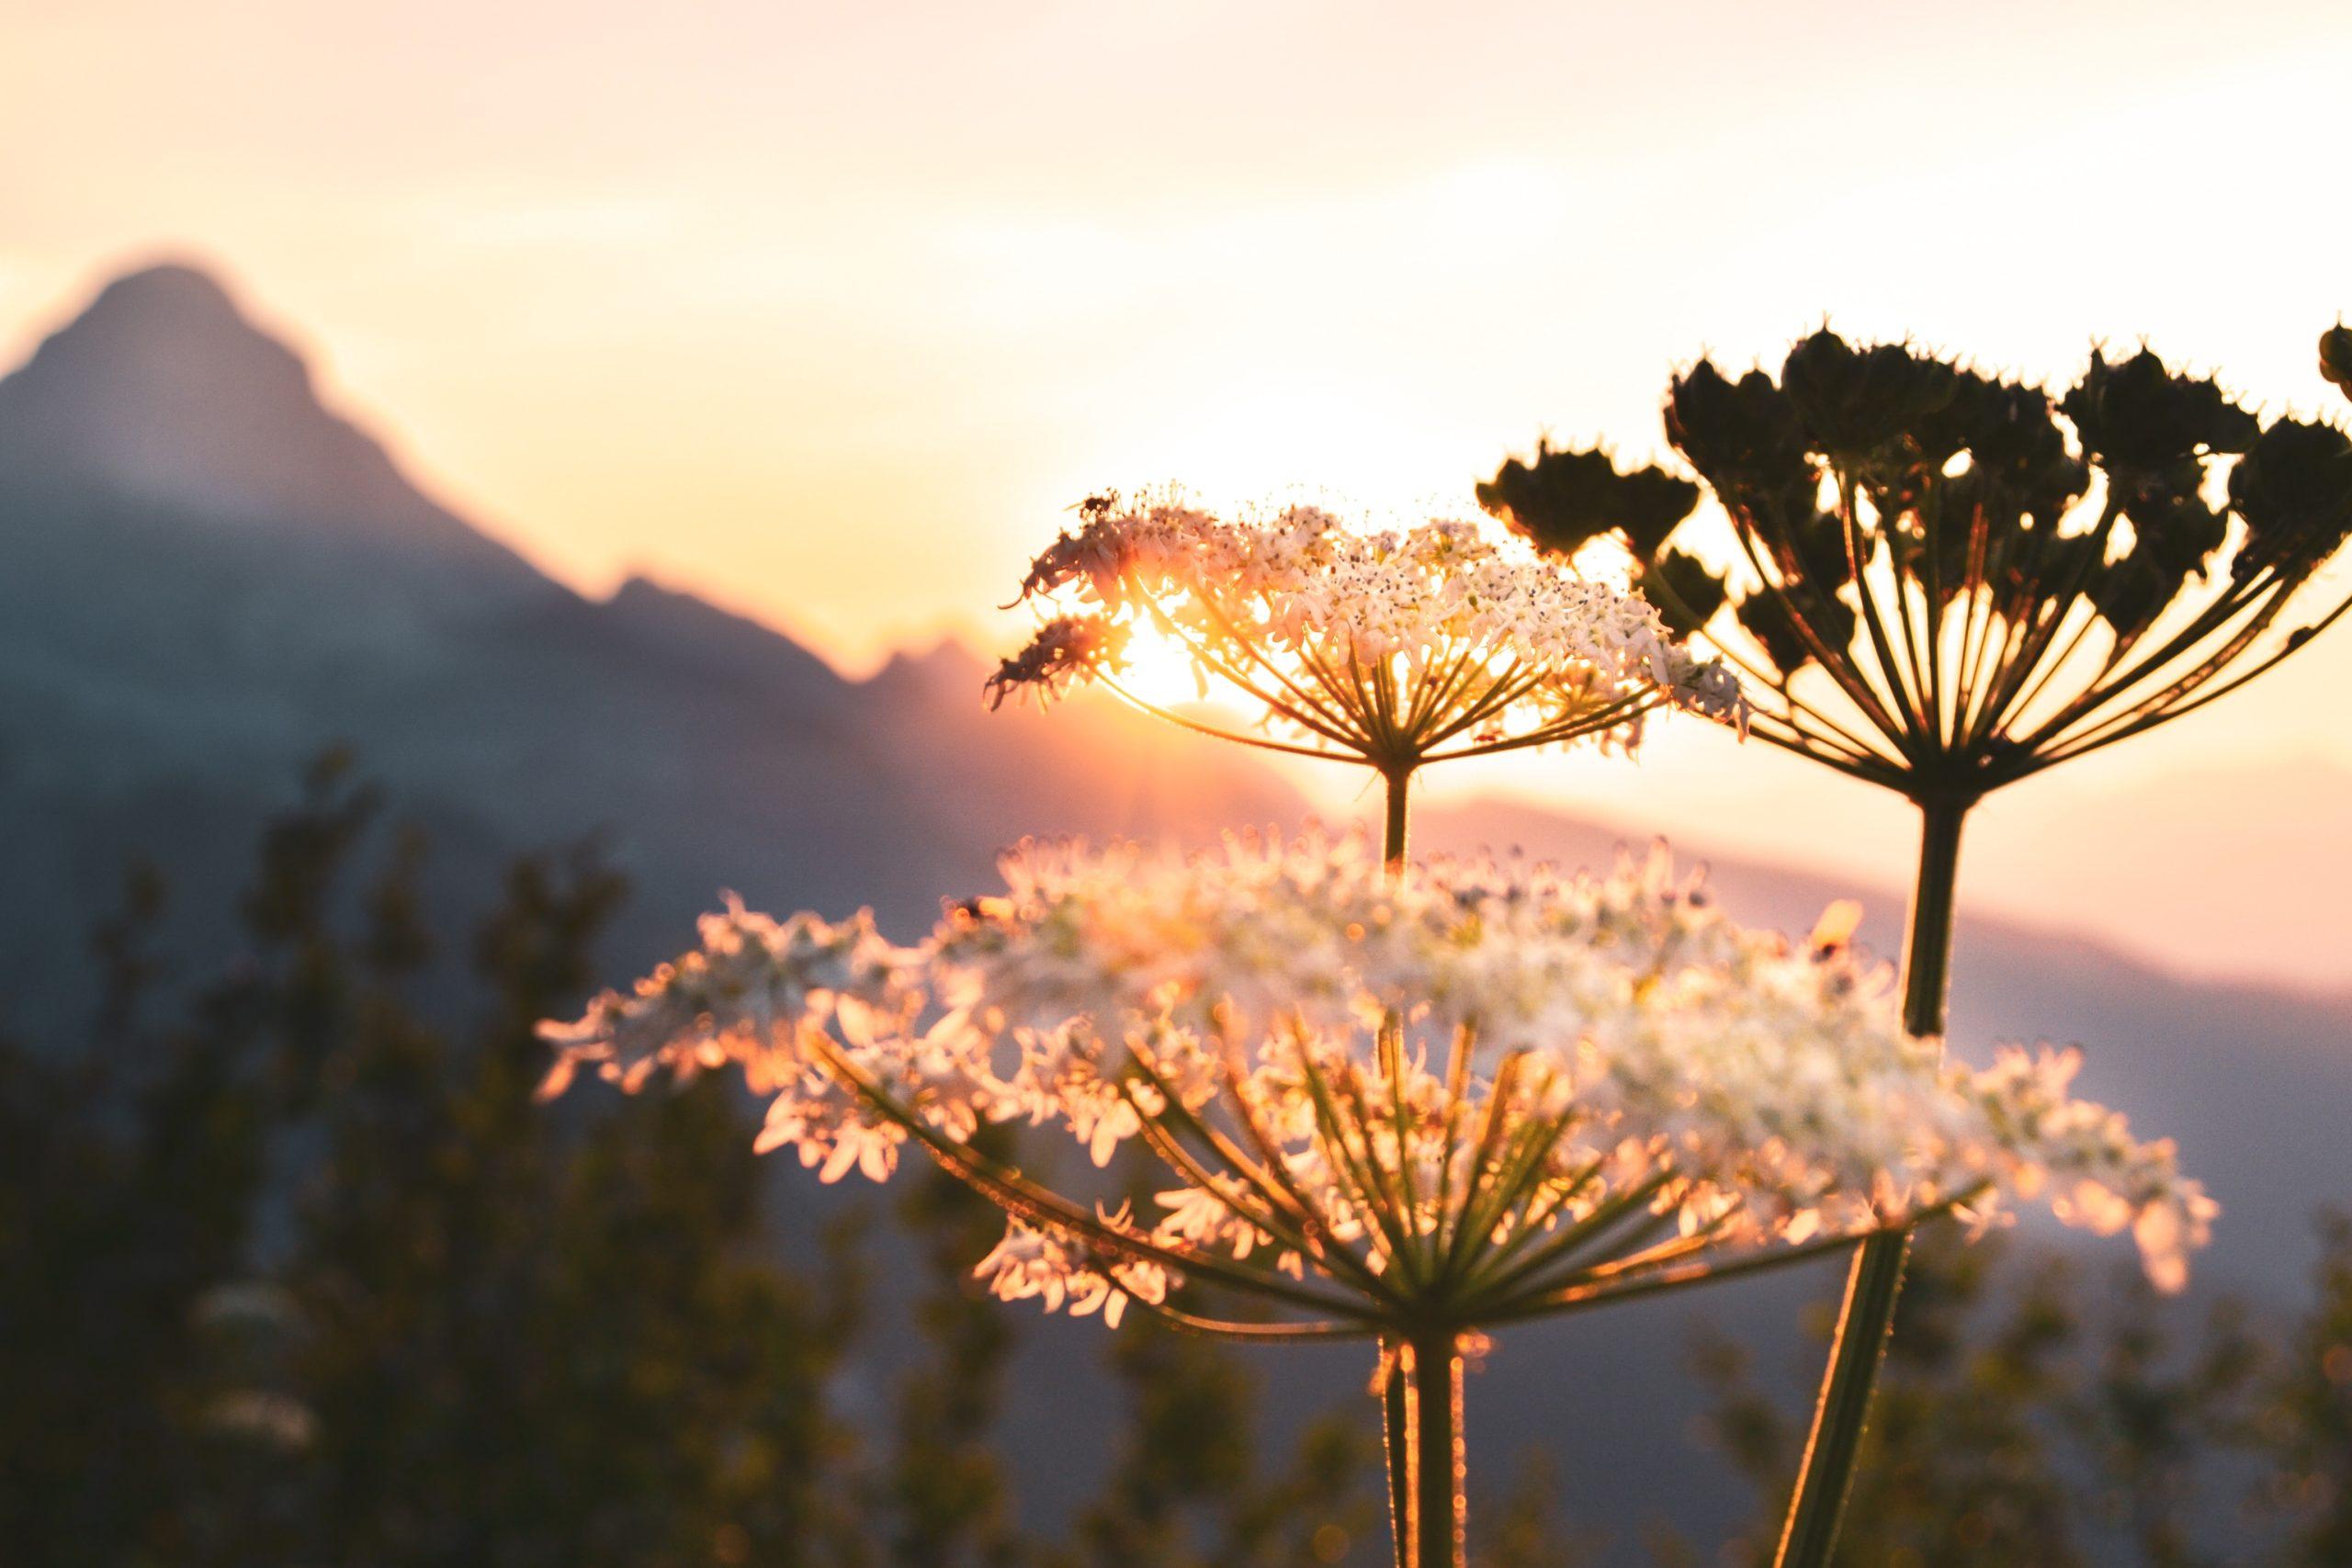 selective focus photograph of dandelion